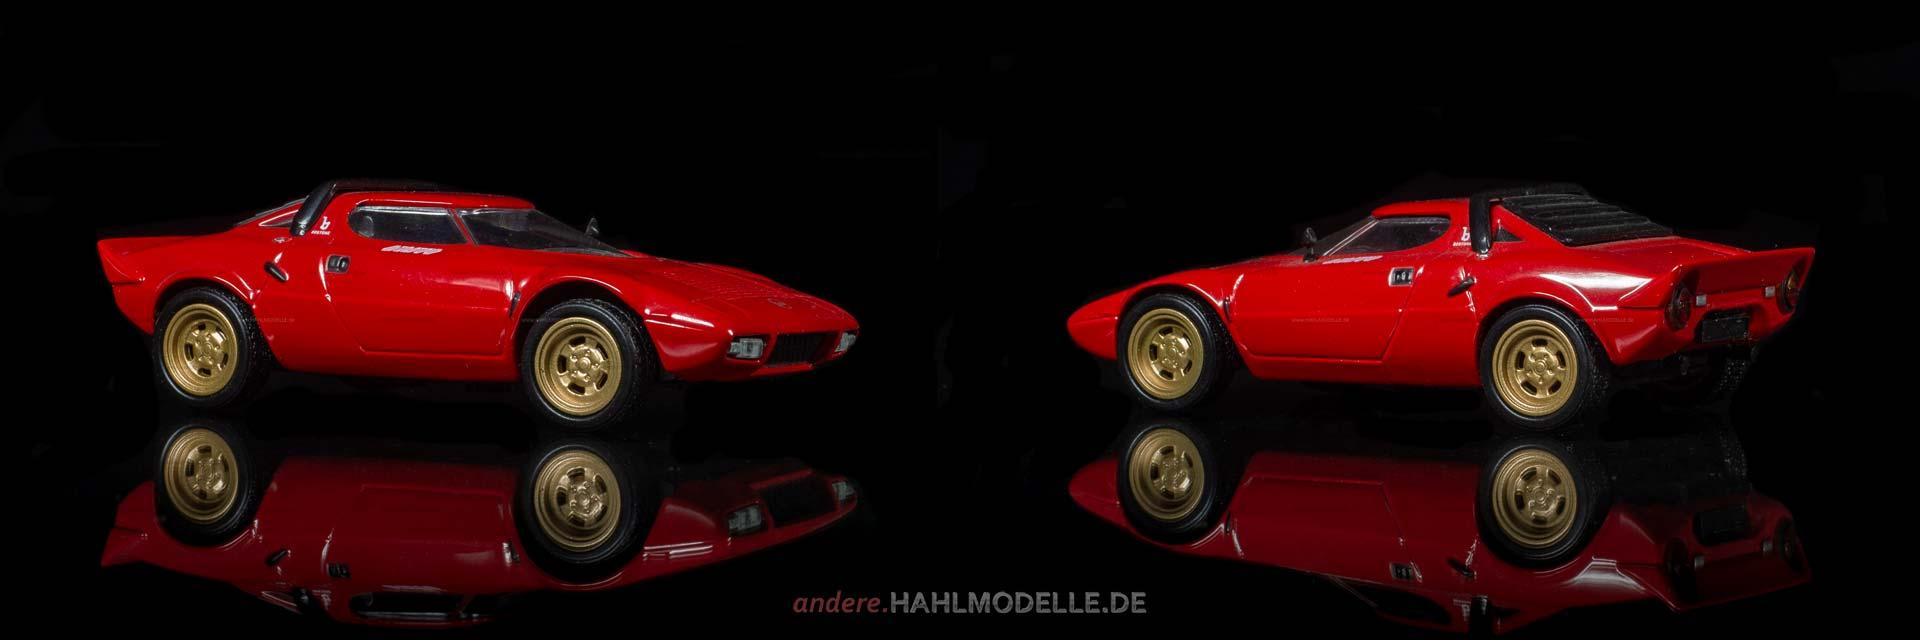 Lancia Stratos HF Stradale | Coupé | Ixo | www.andere.hahlmodelle.de